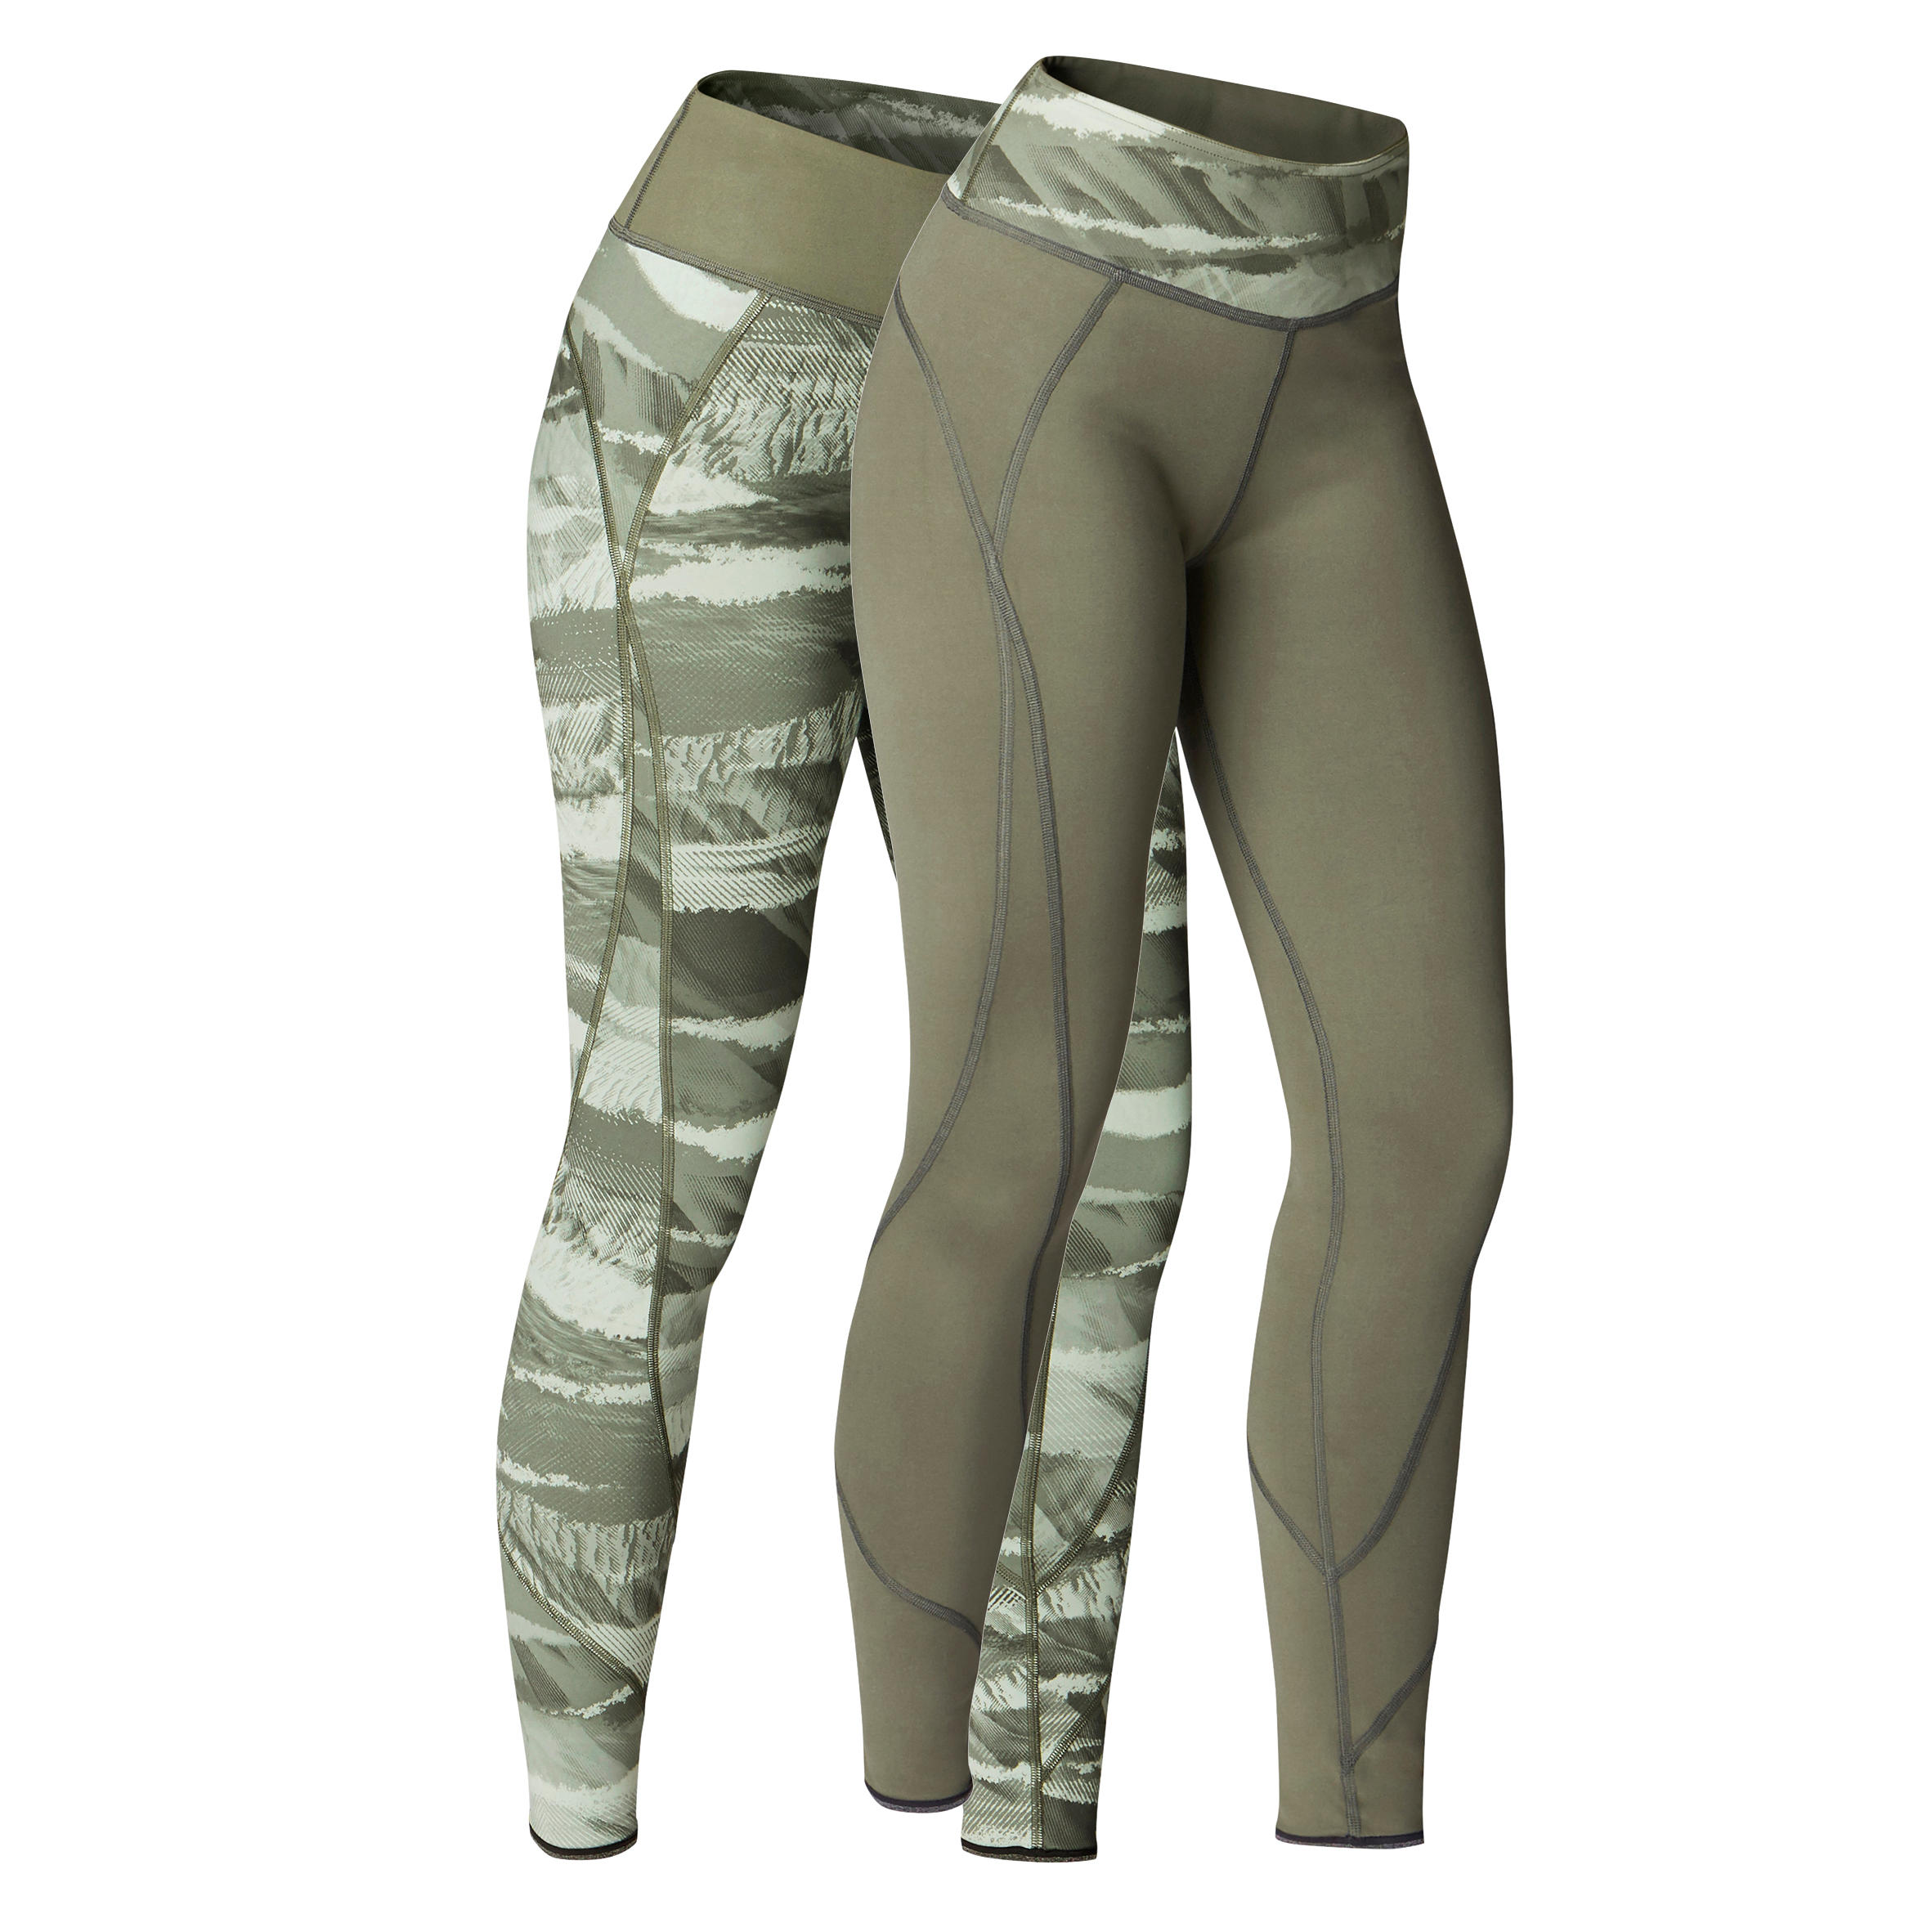 Yoga+ 920 Women's Reversible Leggings - Khaki